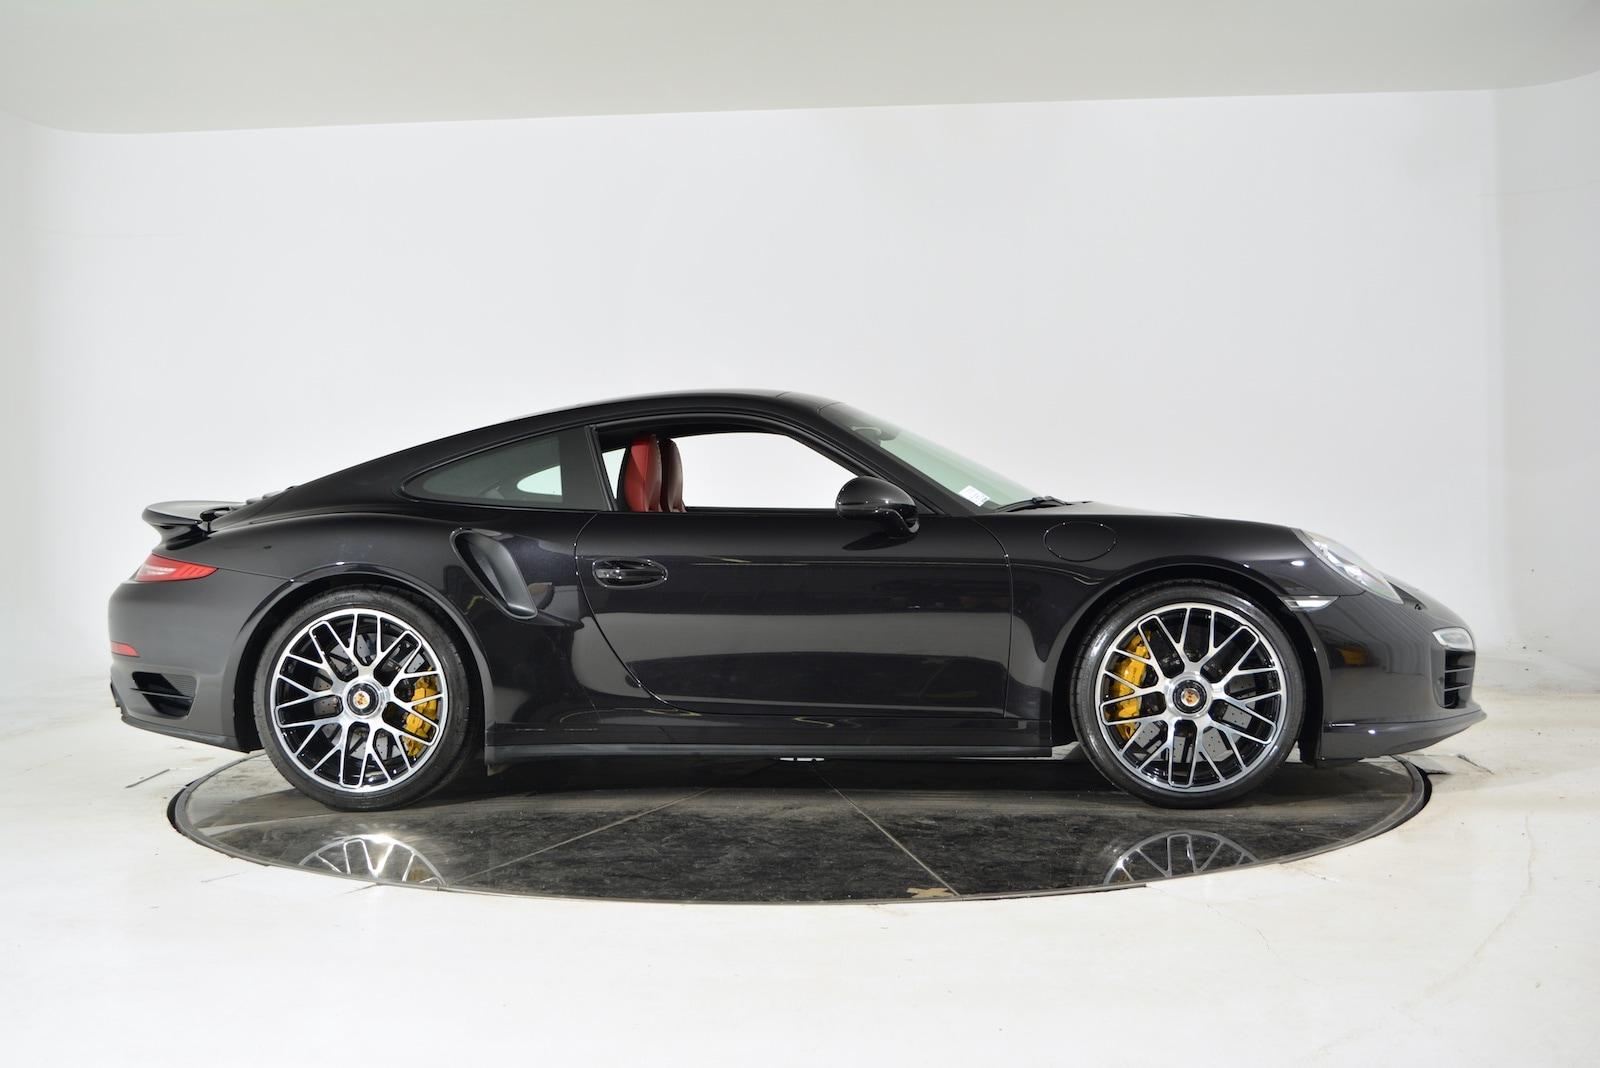 2014 porsche 911 turbo s coupe for sale in fort lauderdale fl at maserati of - Porsche 911 2014 Black